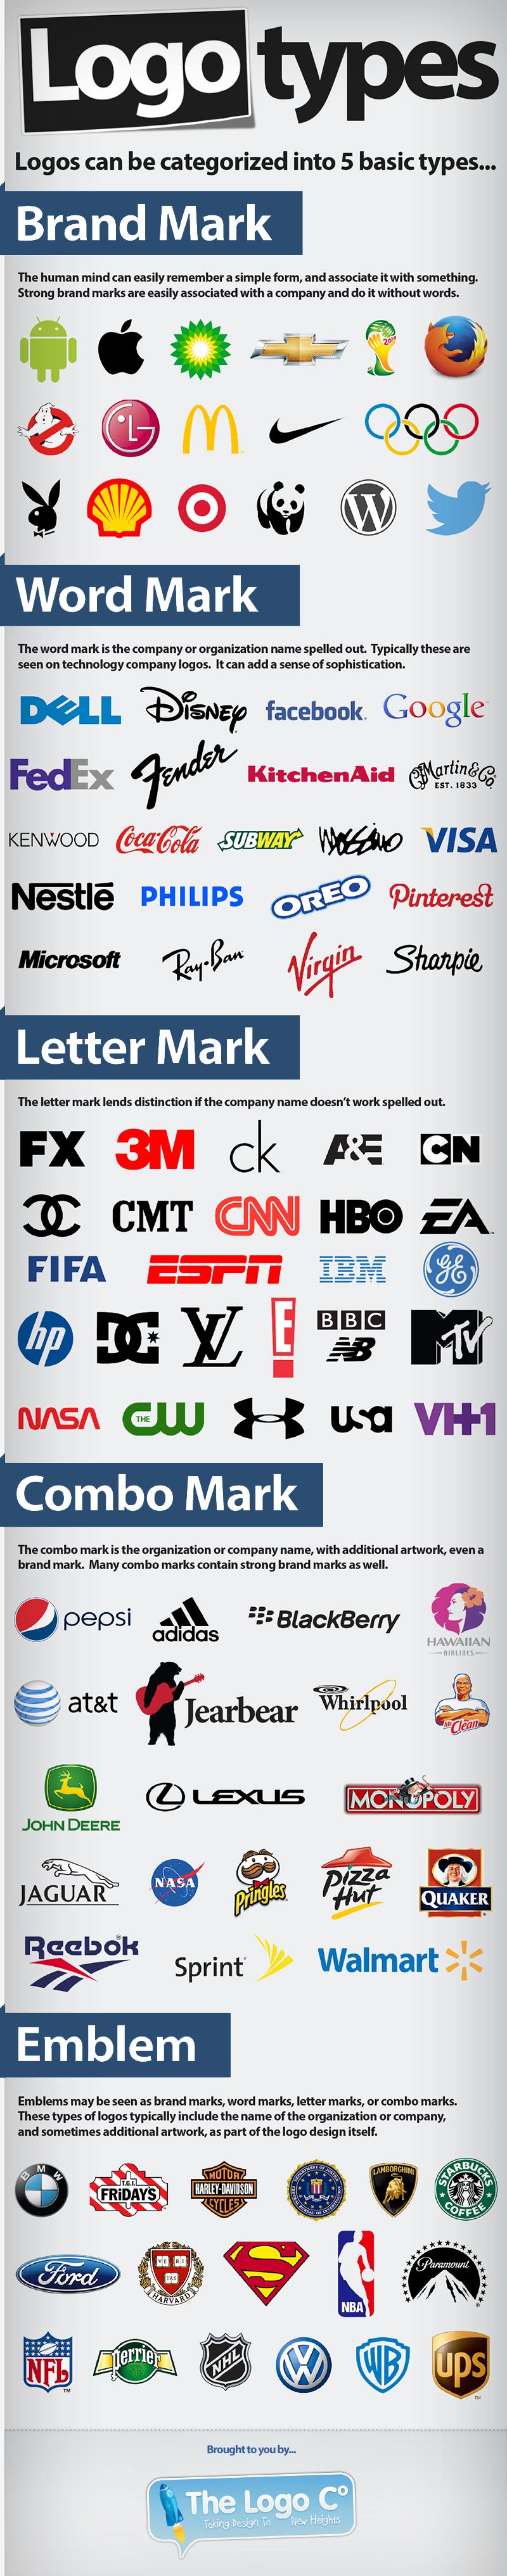 Five logo styles